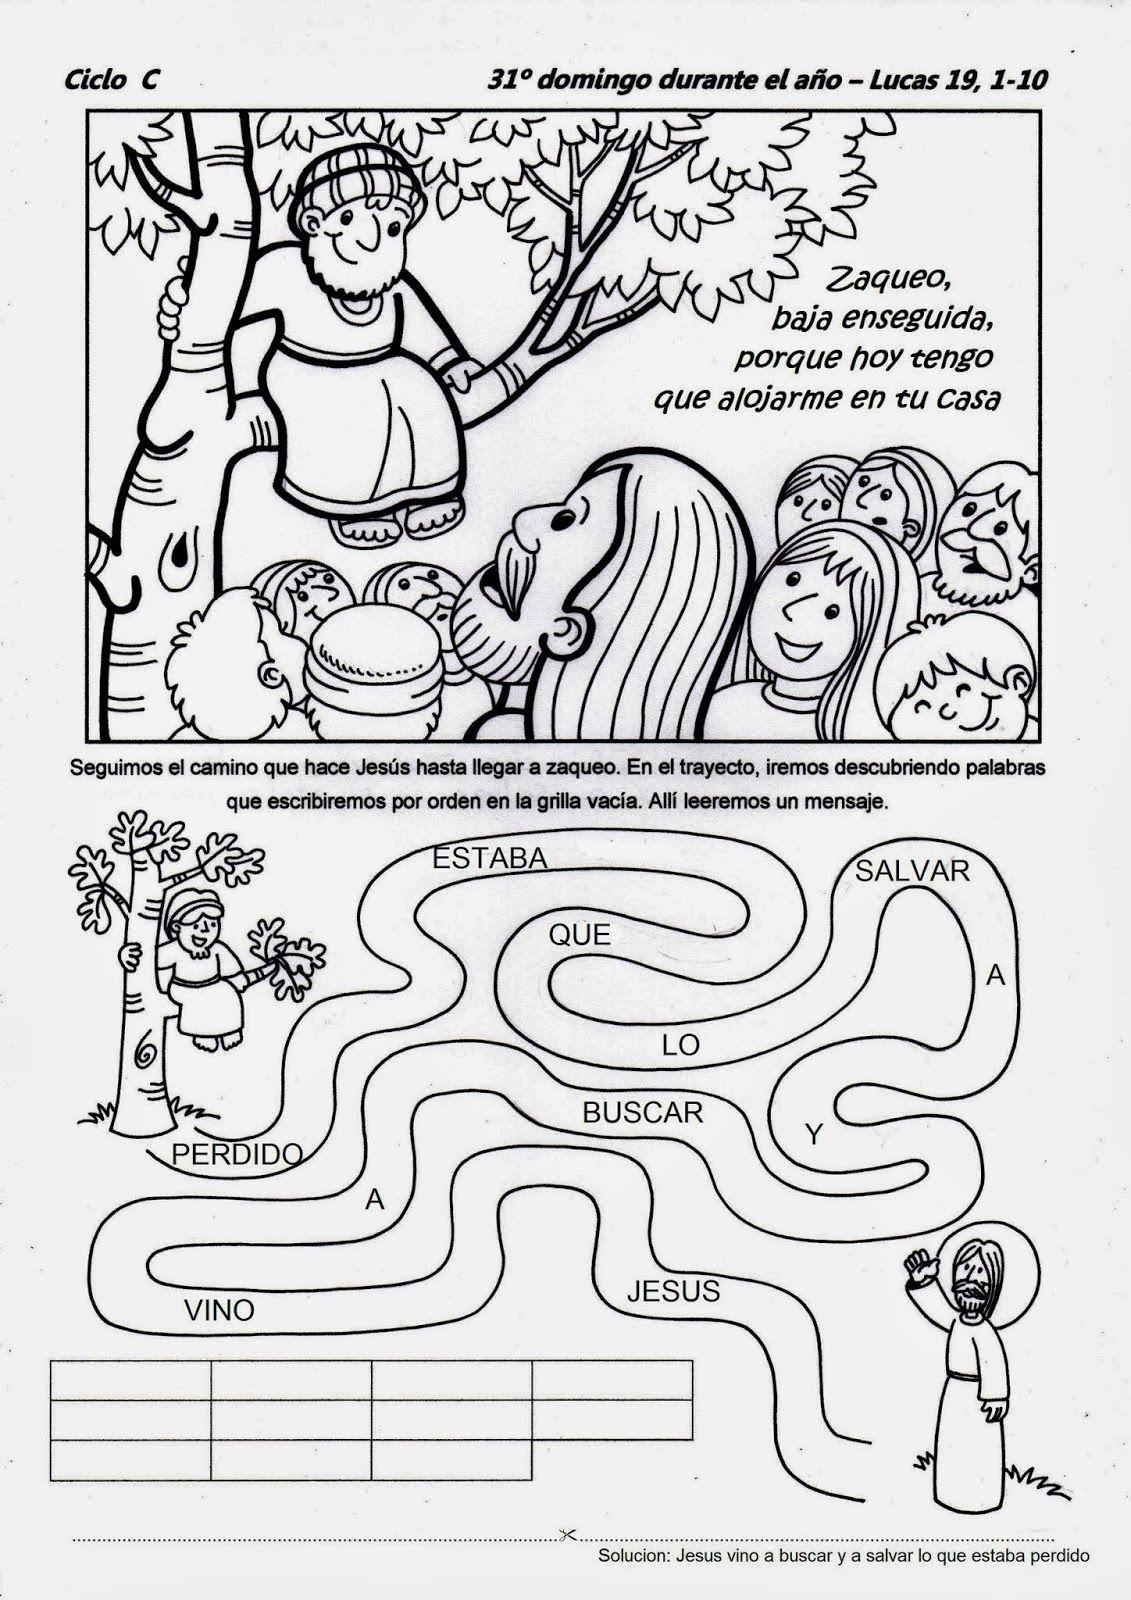 SGBlogosfera. Amigos de Jesús: HISTORIA DE ZAQUEO: ACTIVIDADES ...